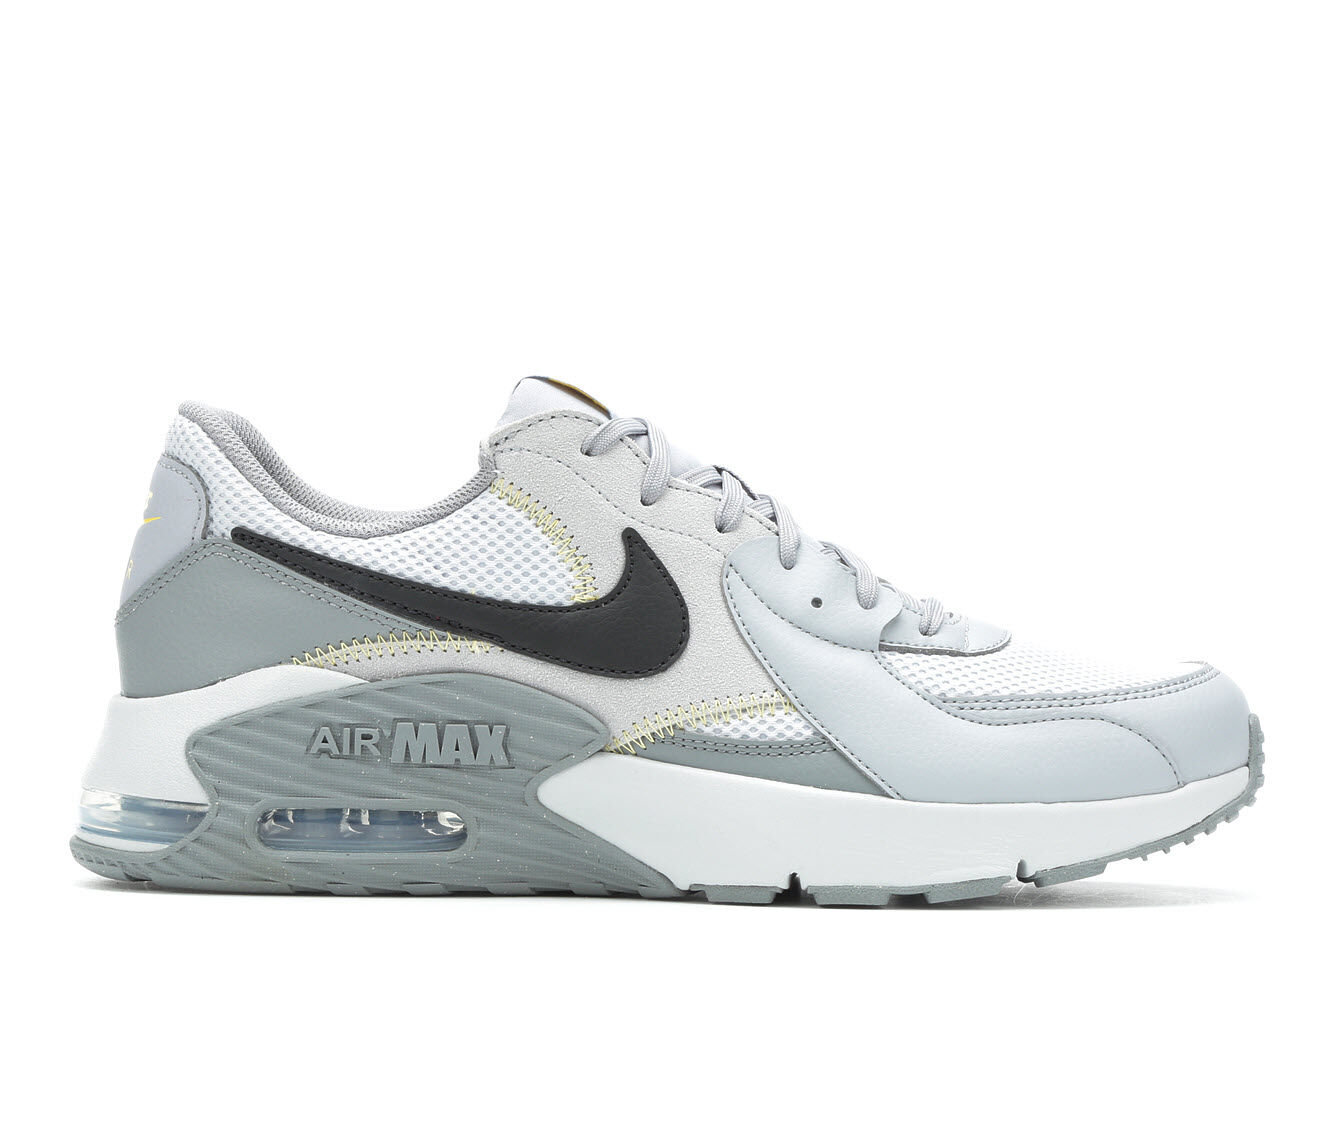 Nike Air Max Excee Sneakers | Shoe Carnival